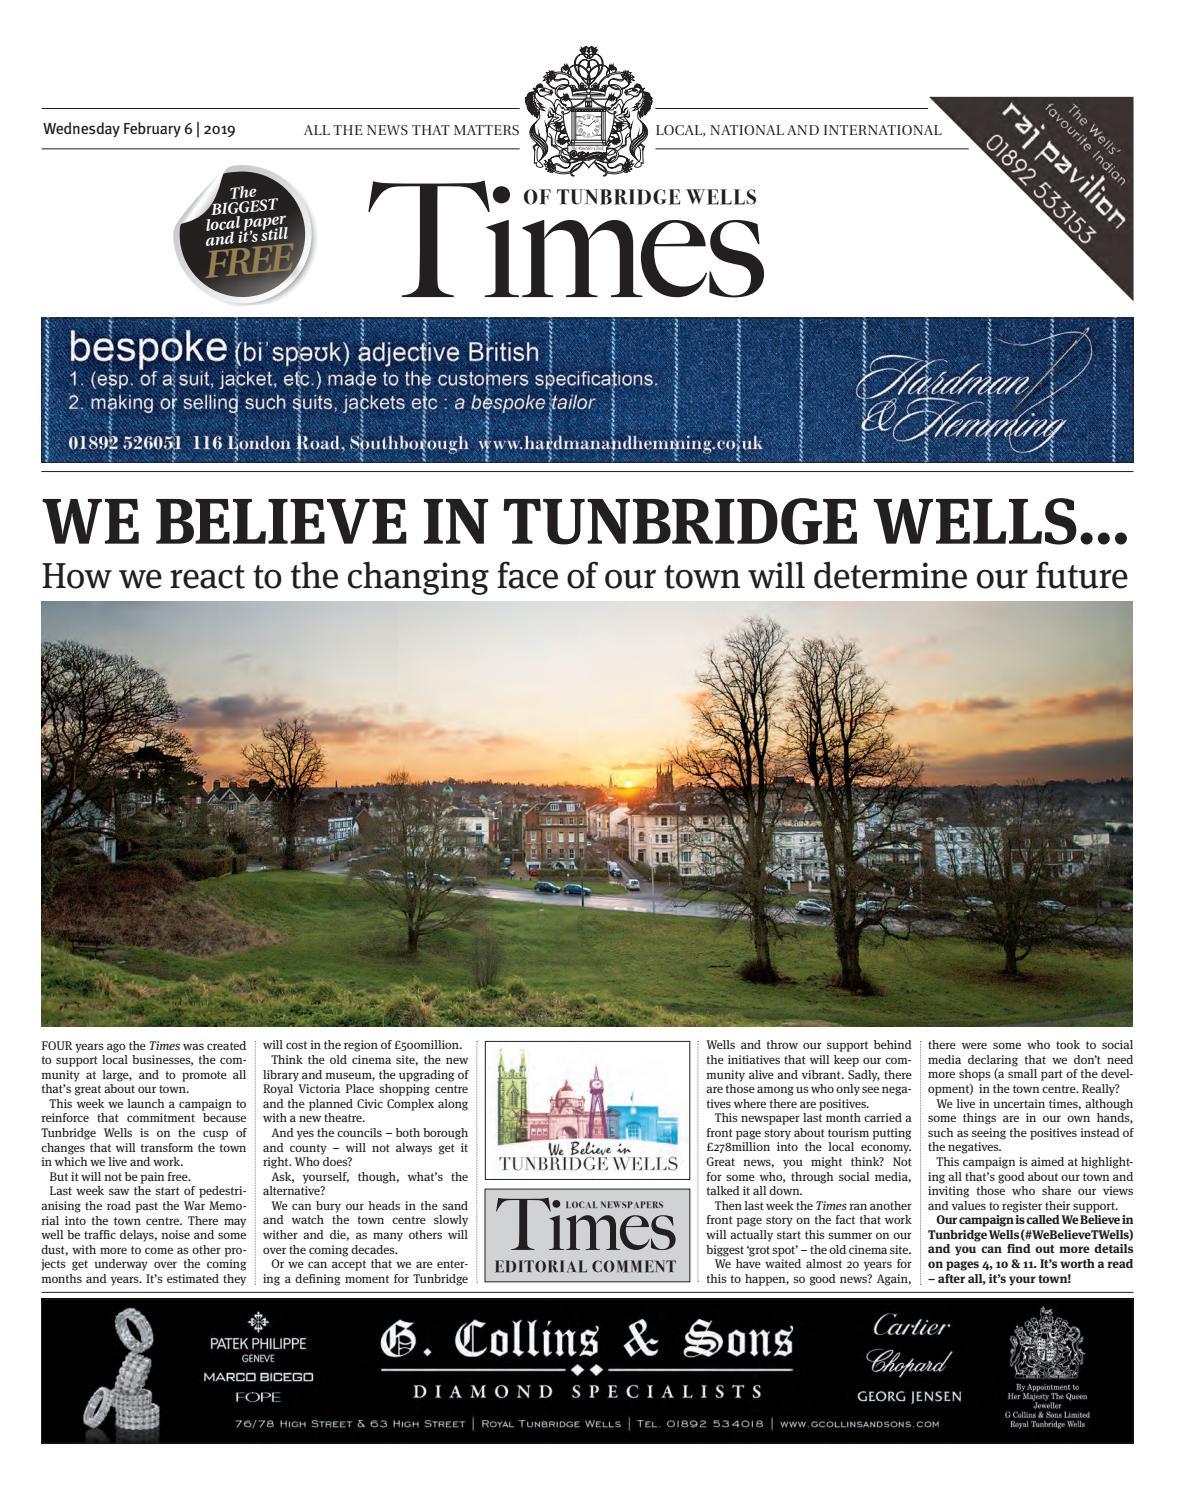 af66899c5c031 Times of Tunbridge Wells 6th February 2019 by One Media - issuu